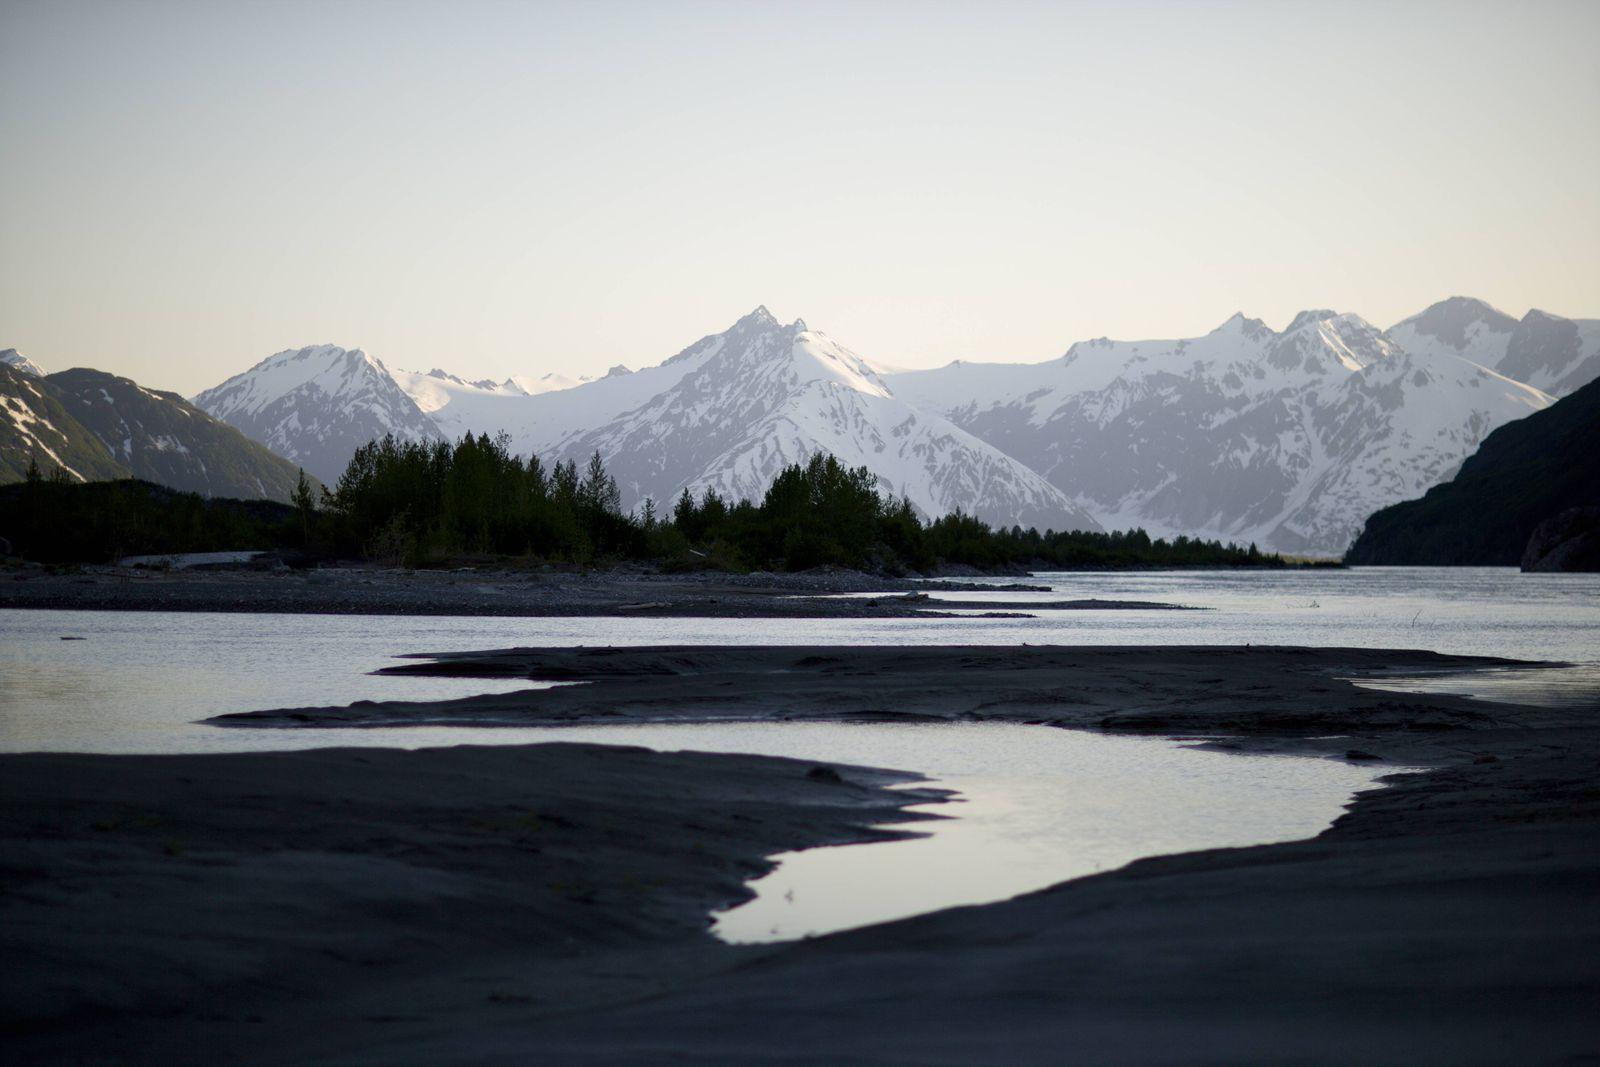 Alsek River & mountains Walker Glacier Alaska United States PUBLICATIONxINxGERxSUIxAUTxONLY Copyri